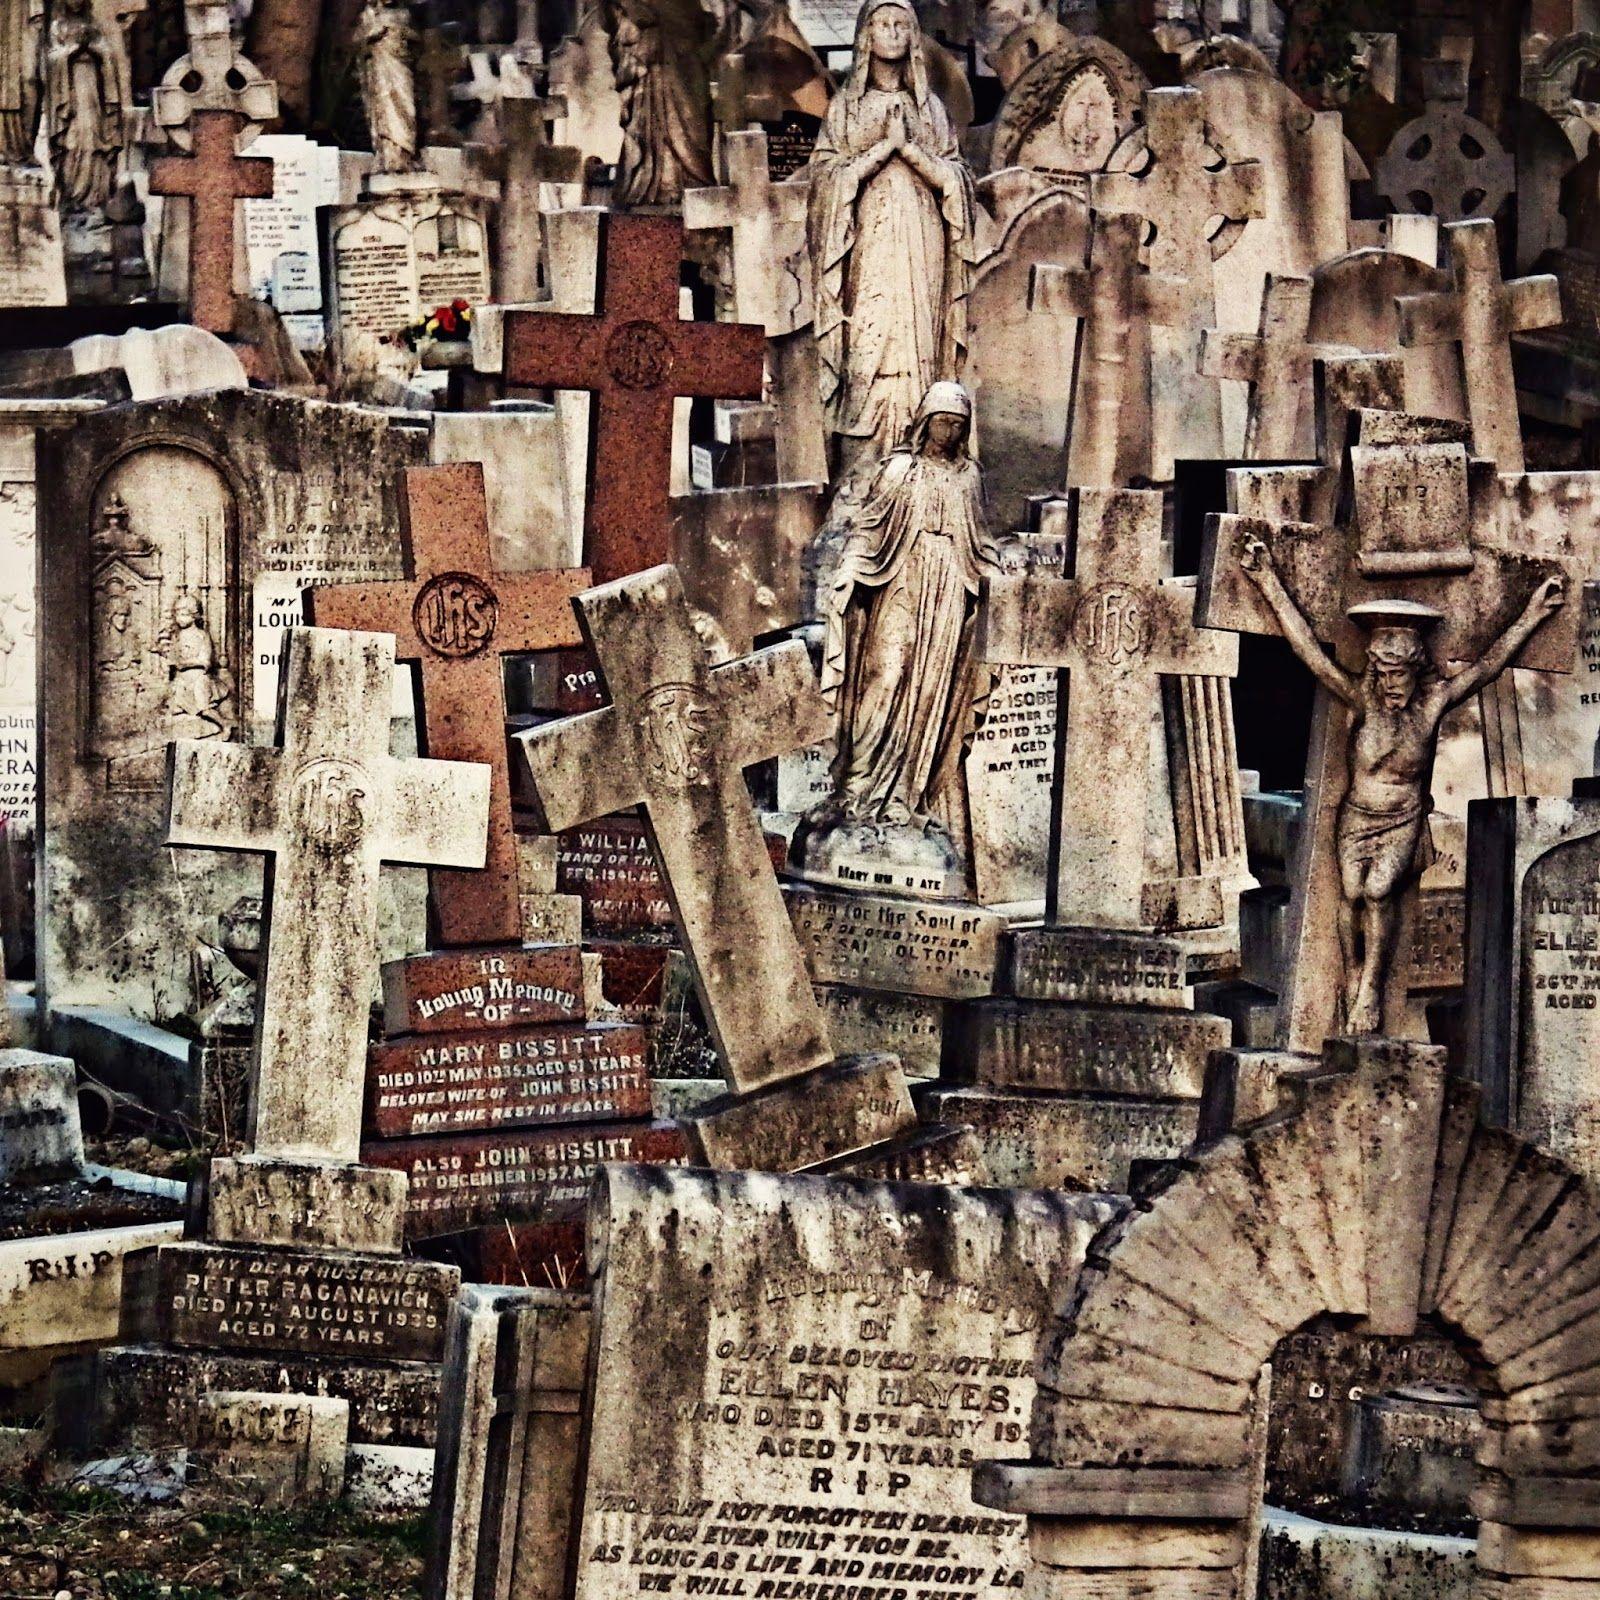 The London Muerto: Católica Romana Cementerio de San Patricio, Leyton